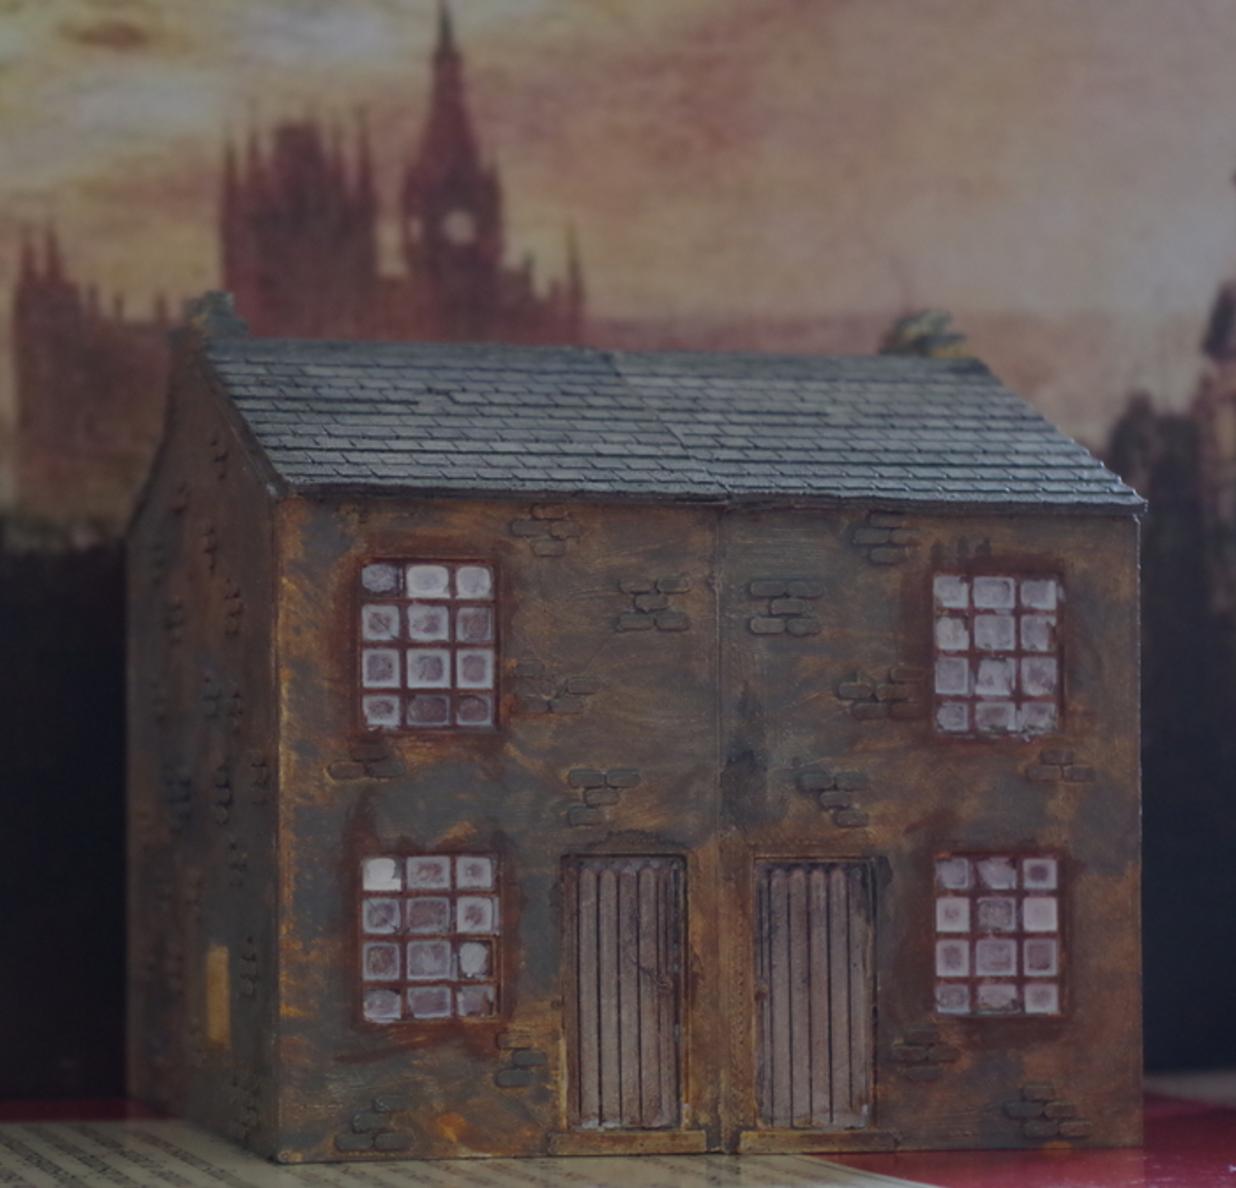 Capture d'écran 2017-06-30 à 09.34.53.png Download free STL file Ripper's London - Terraced houses • Model to 3D print, Earsling